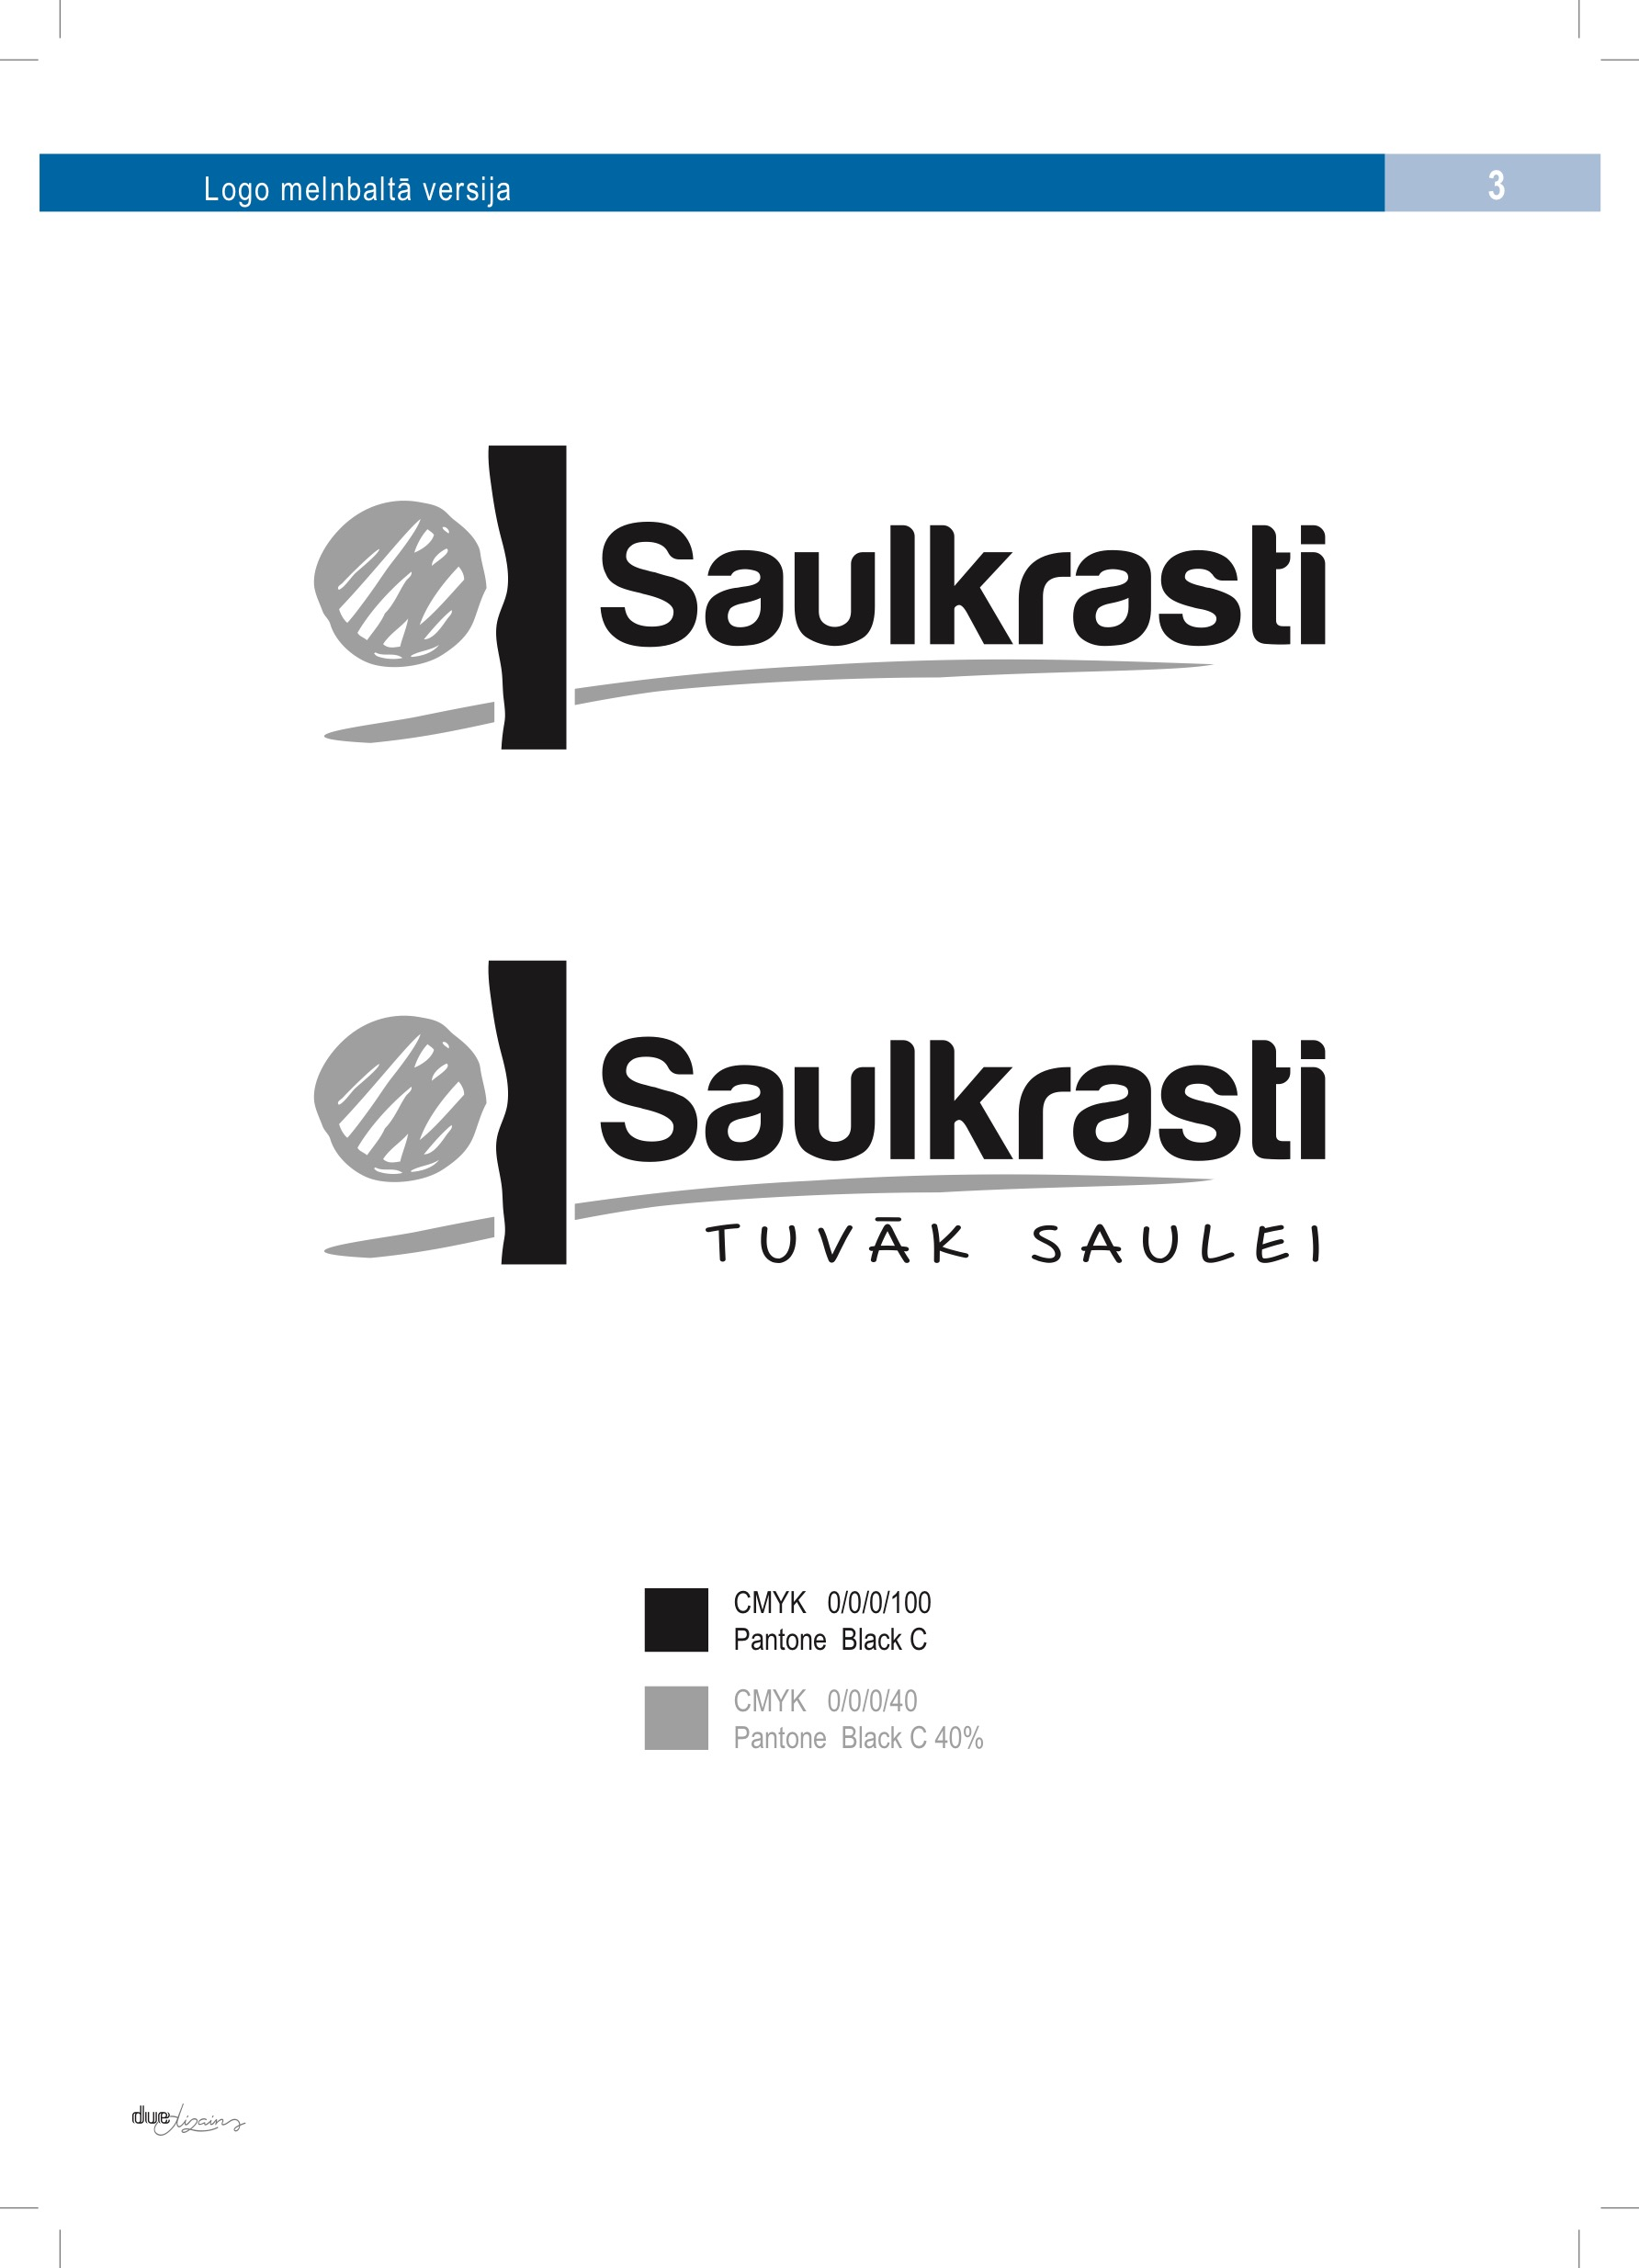 saulkrasti-print 5